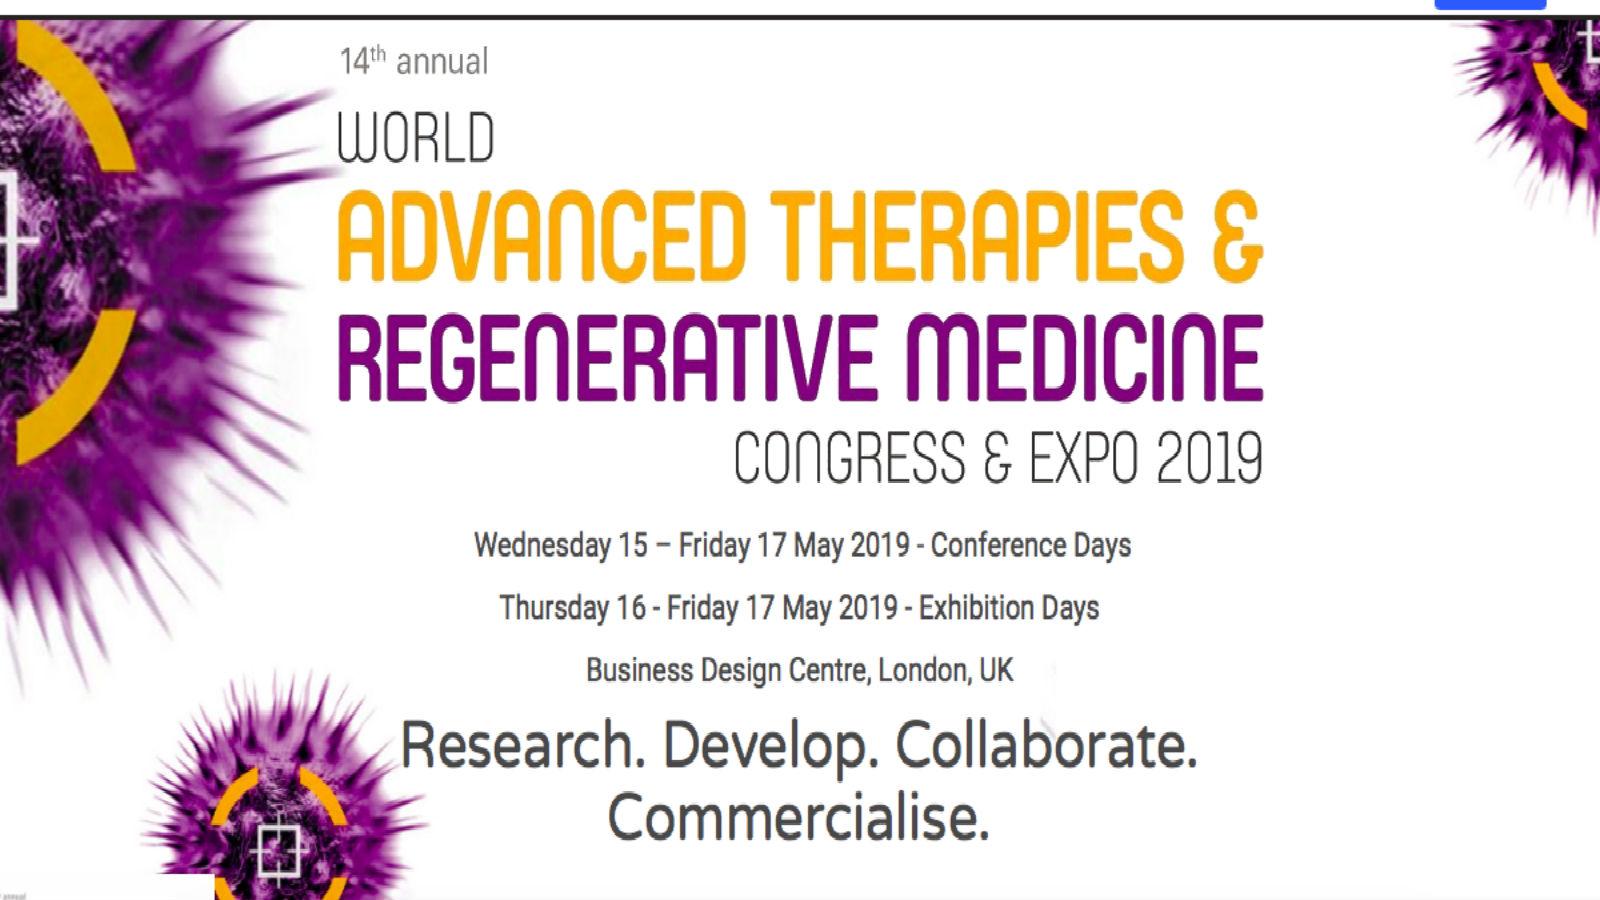 World Advanced Therapies & Regenerative Medicine Congress(14th).jpg